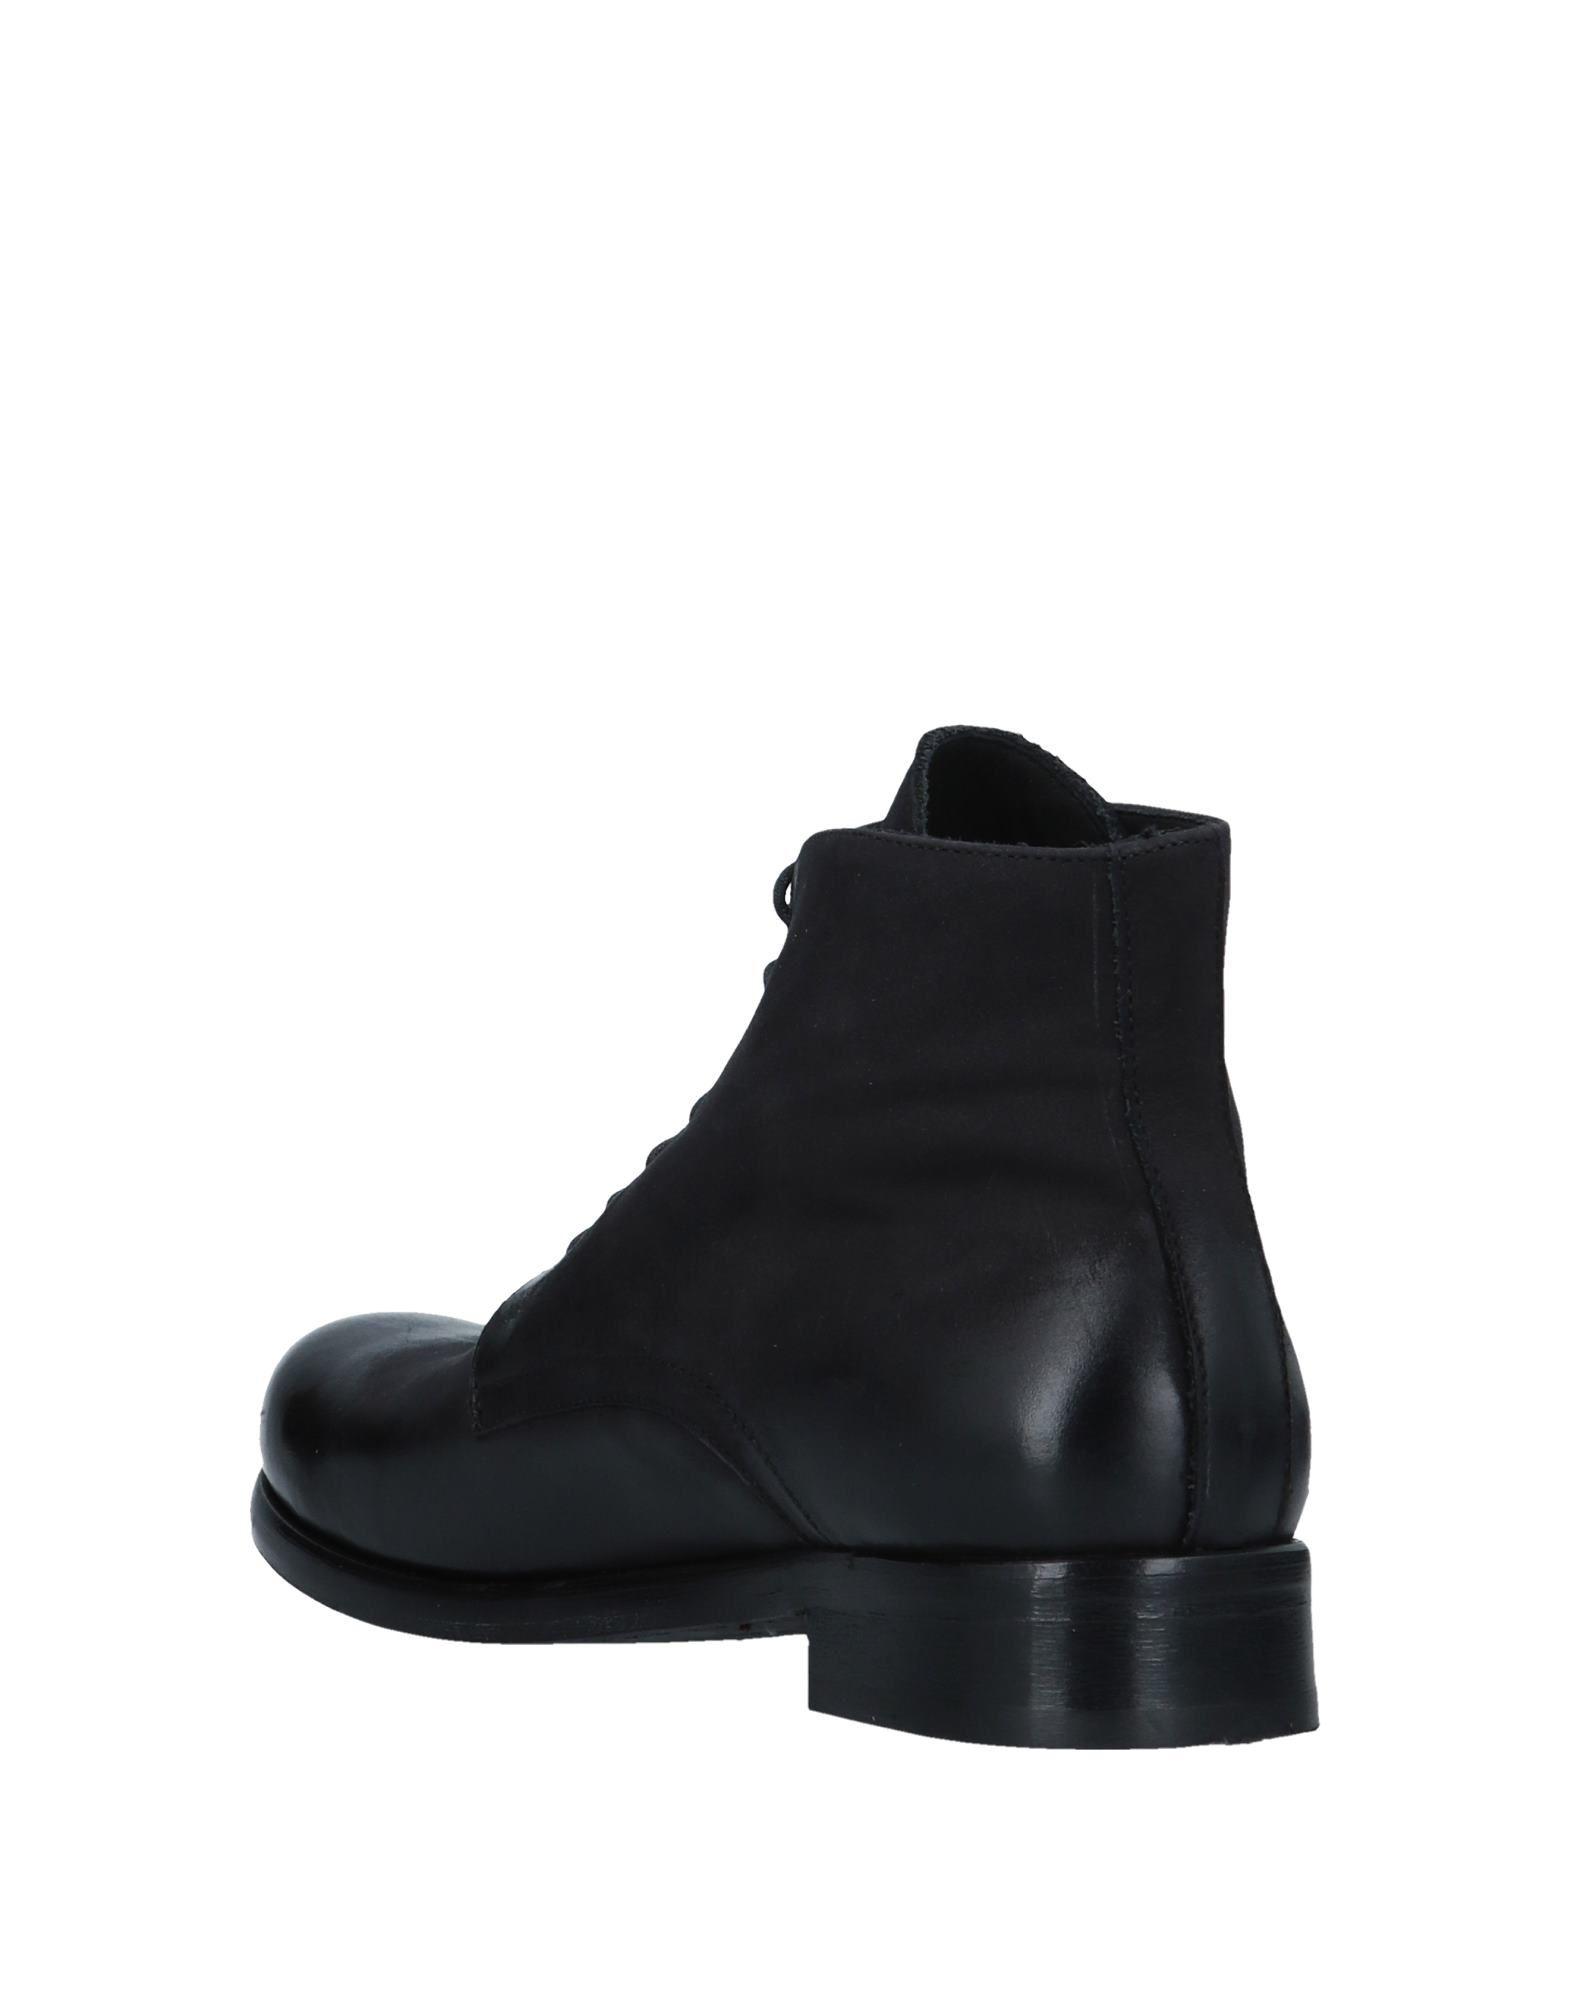 Rabatt Stiefelette echte Schuhe Savio Barbato Stiefelette Rabatt Herren  11536879KV a0c4a6